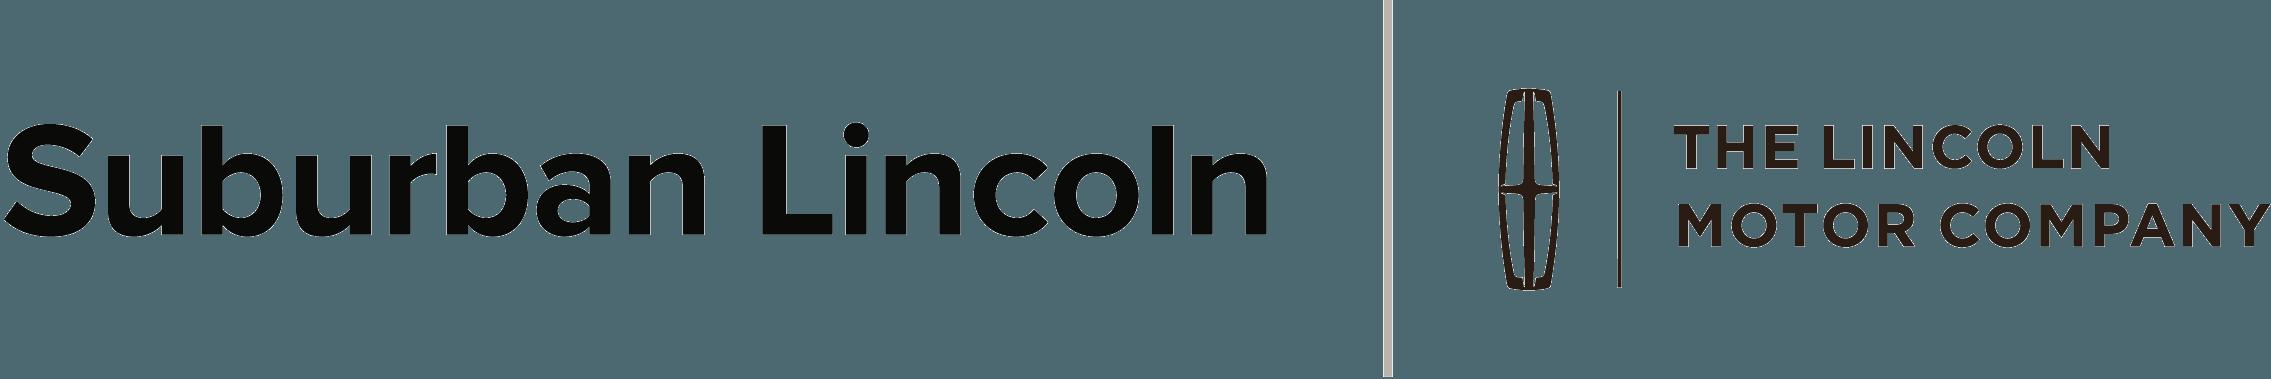 Suburban Lincoln